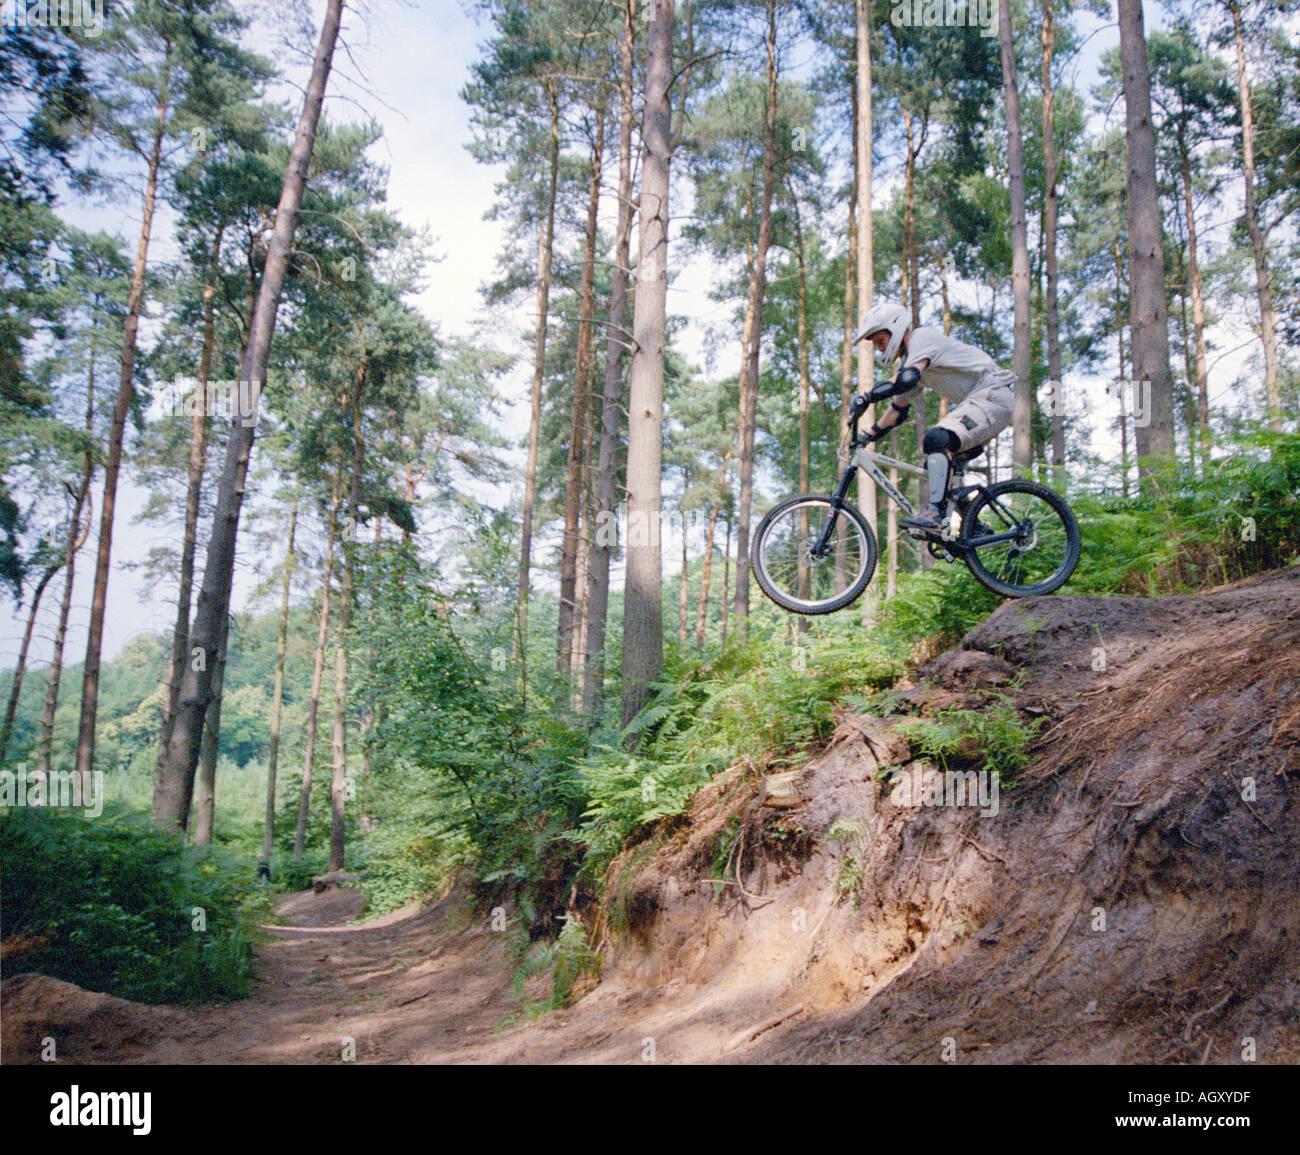 PICTURE CREDIT DOUG BLANE Mountain Biking at the bike park Brickhill Woods Wobrn Sands near Milton Keynes MK - Stock Image